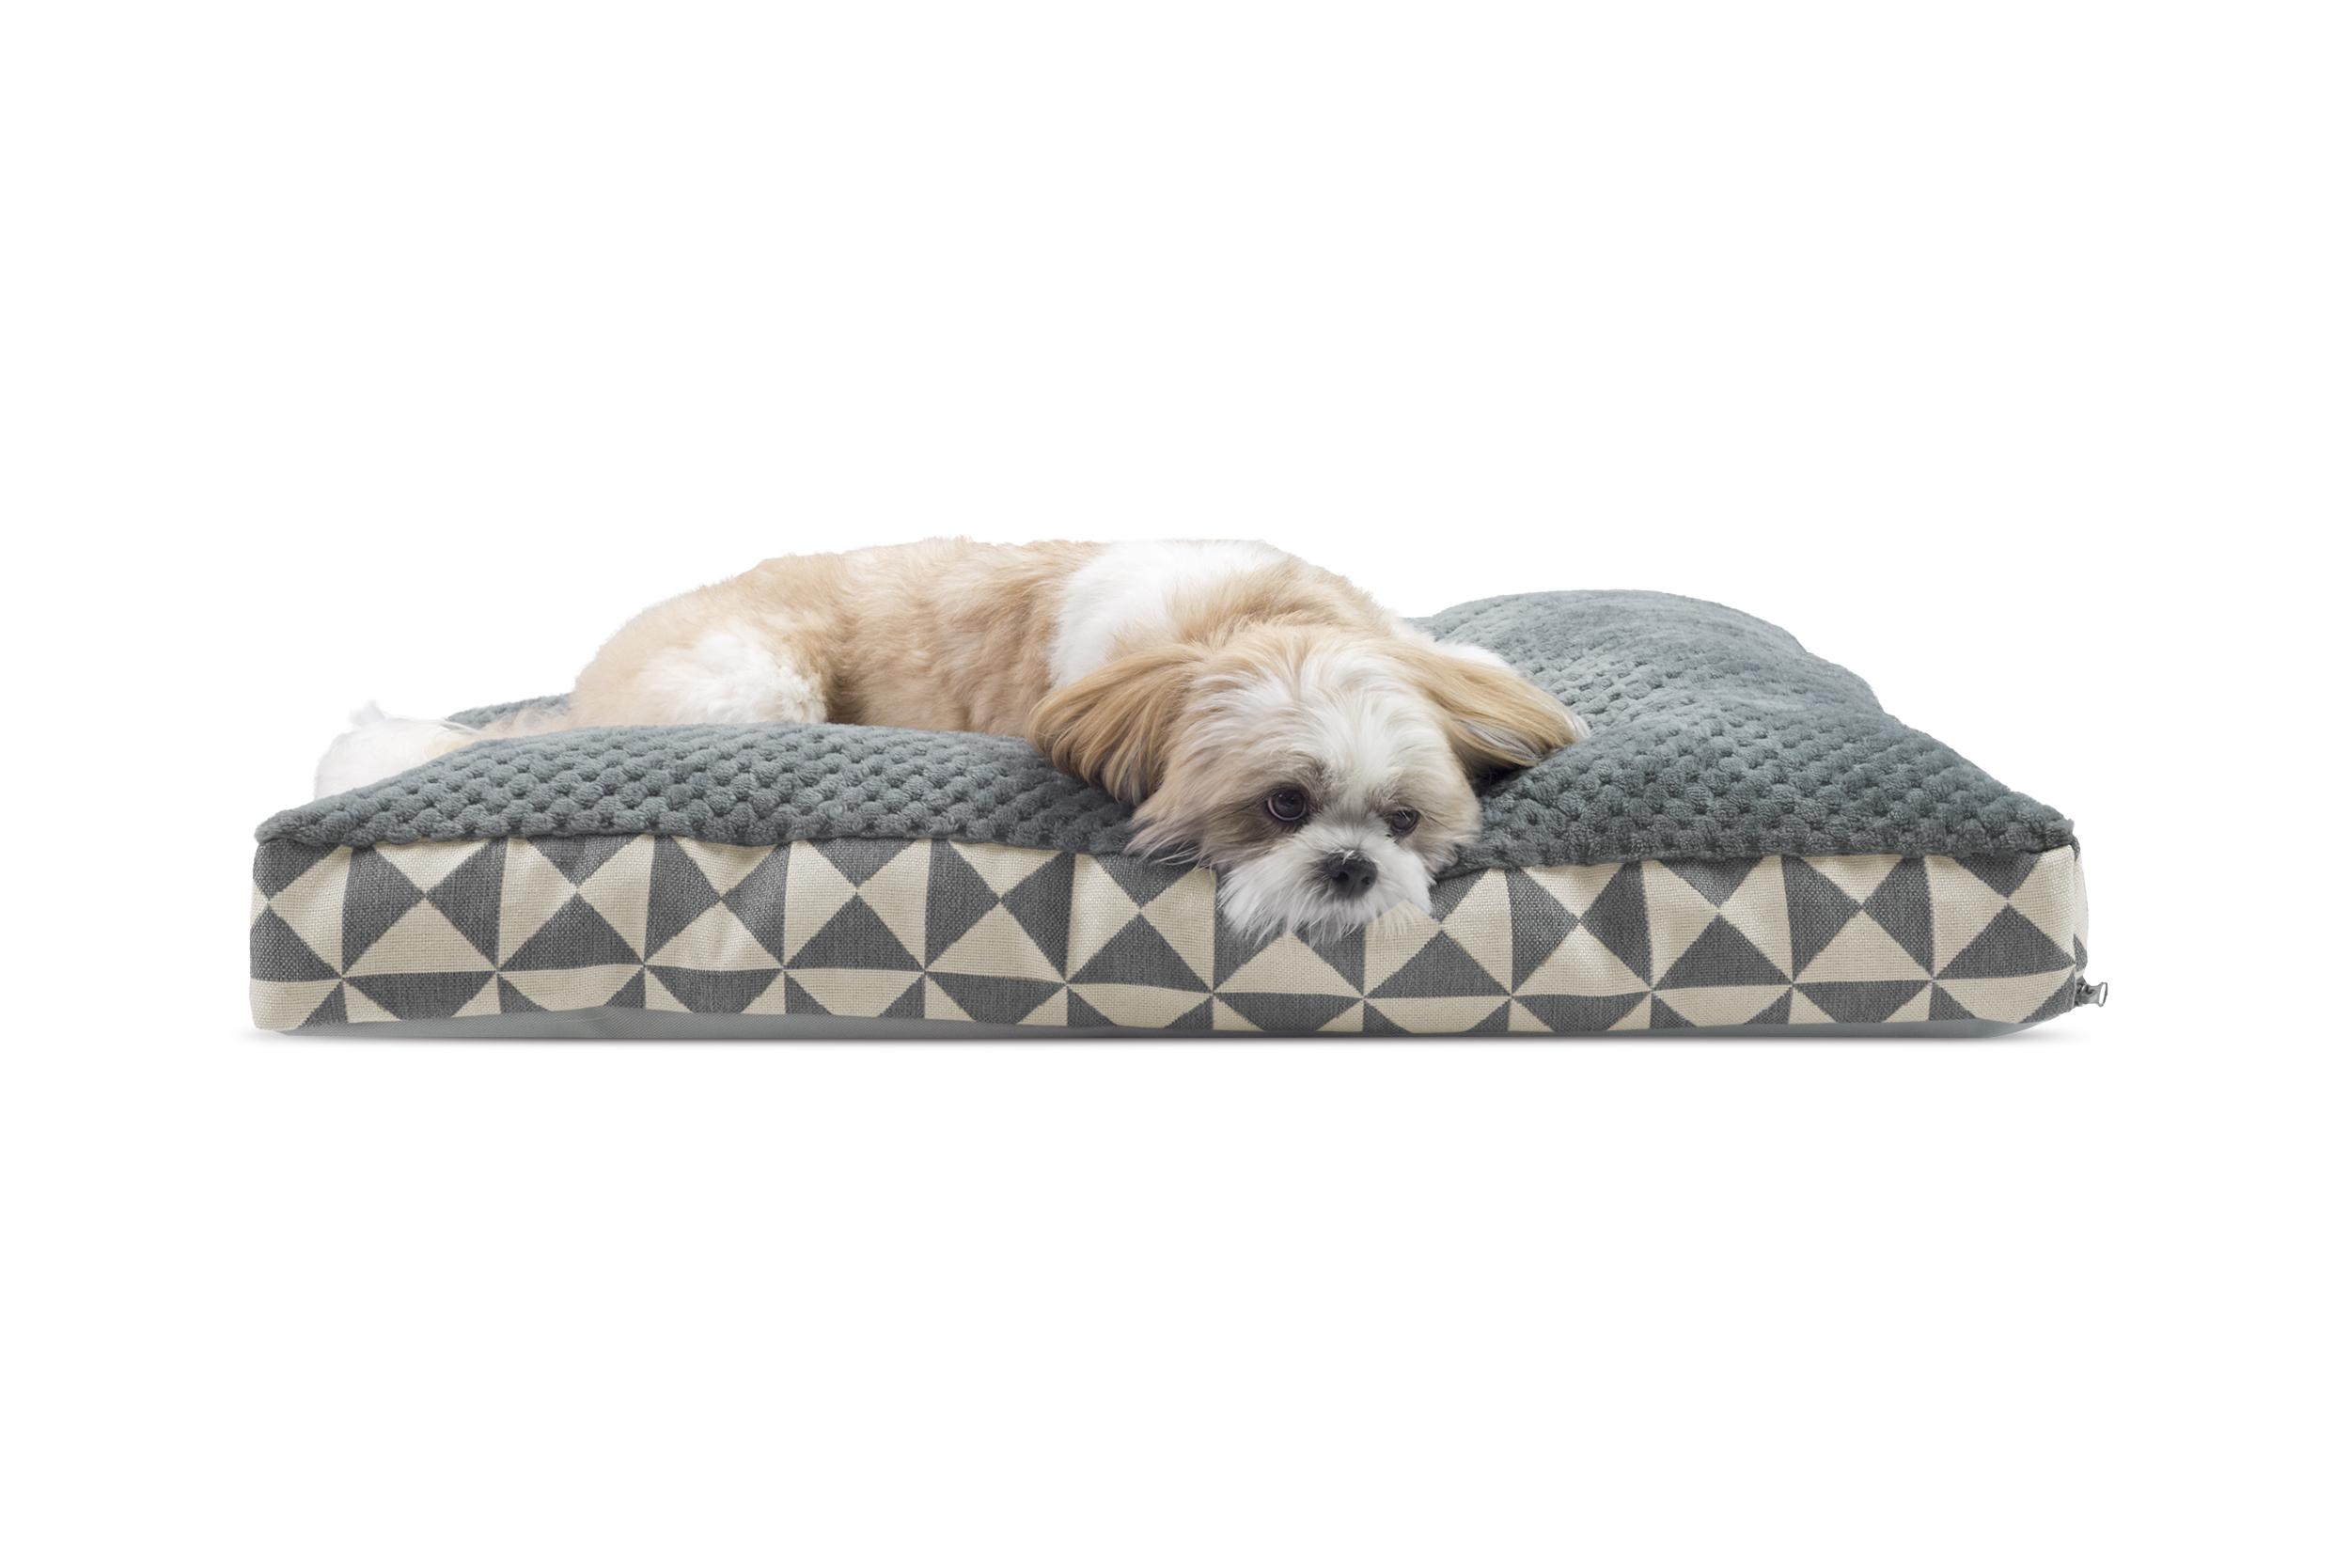 Furhaven Kilim Deluxe Pillow Pet Bed Dog Bed Ebay